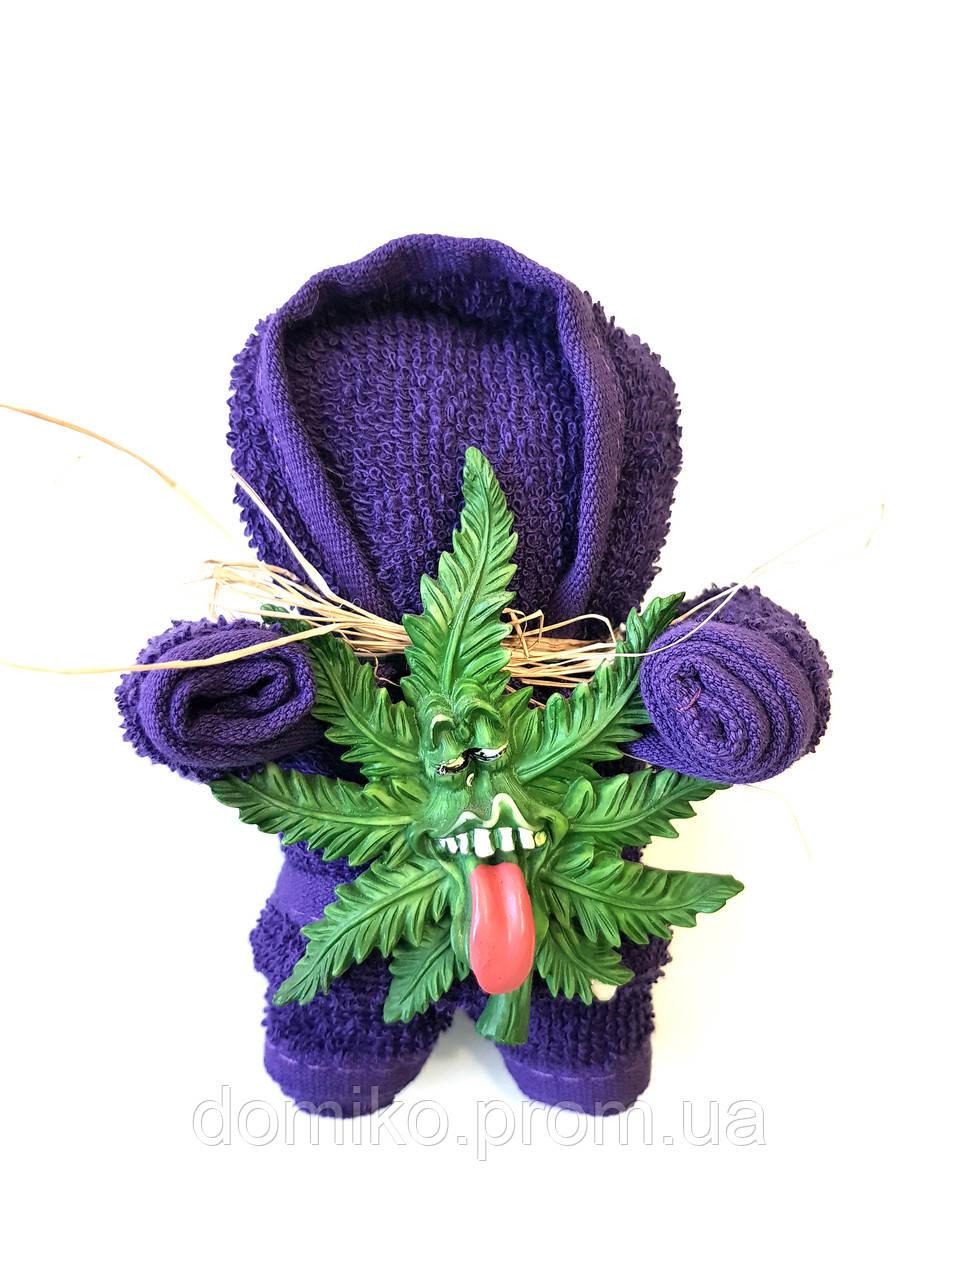 Подарок из махрового полотенца Веселая лялька